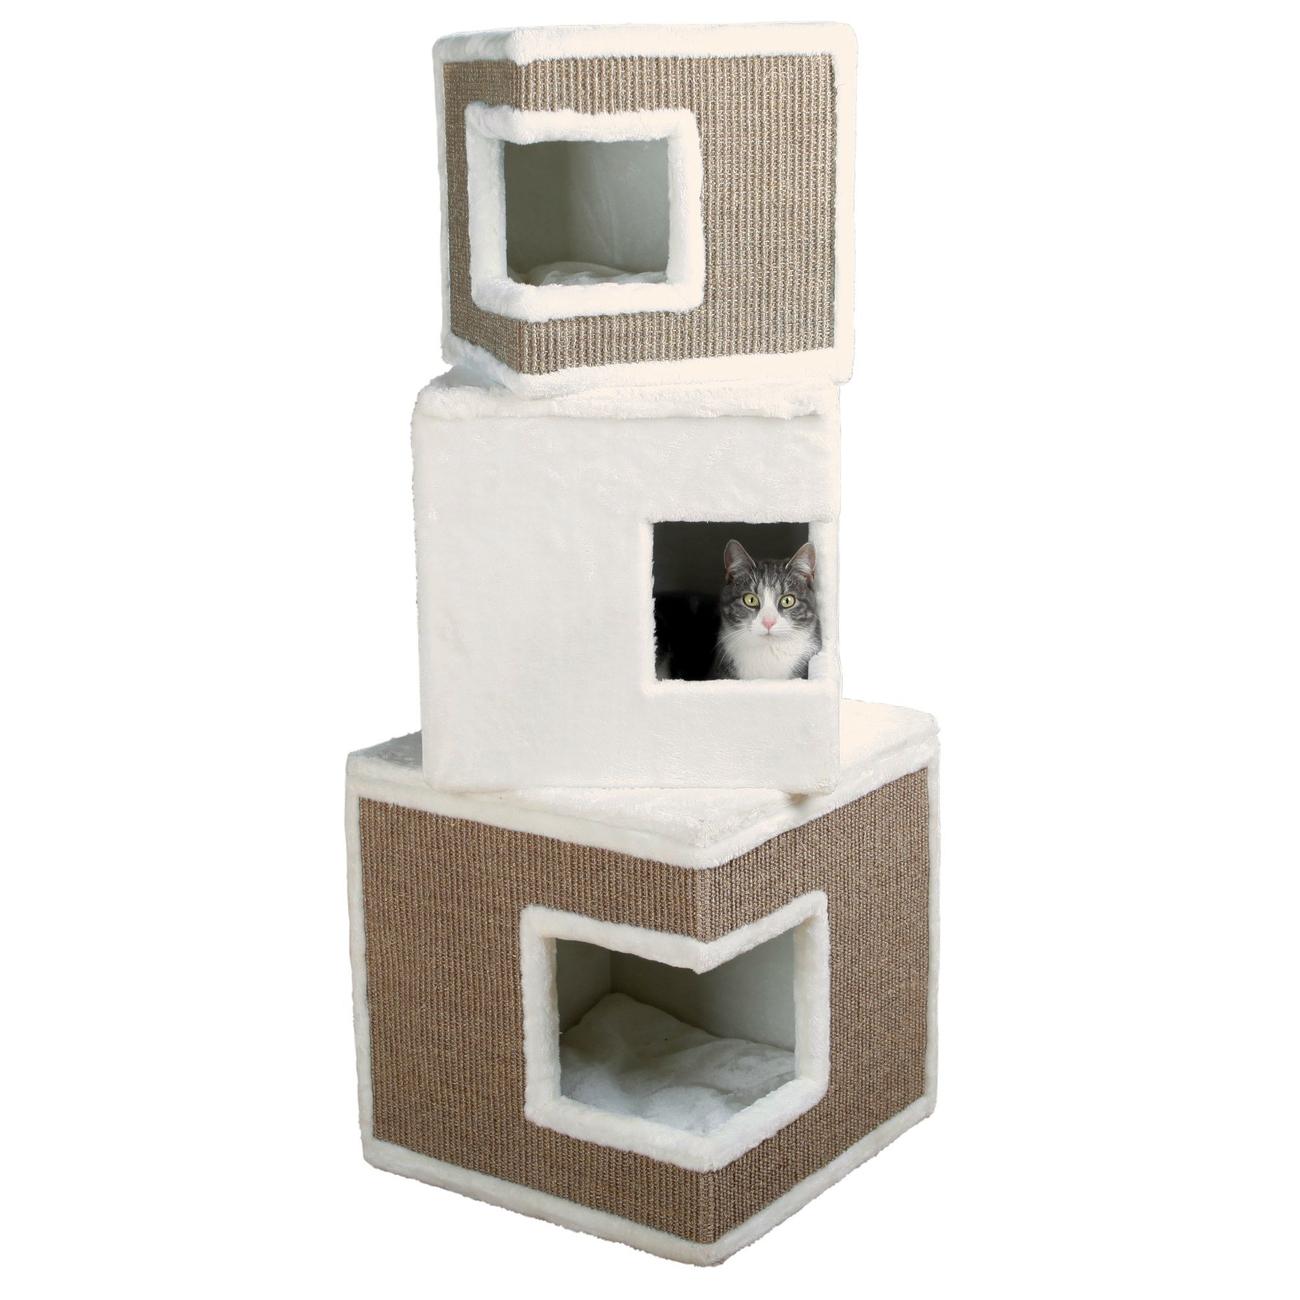 Trixie Katzenturm Cat Tower Lilo 43377